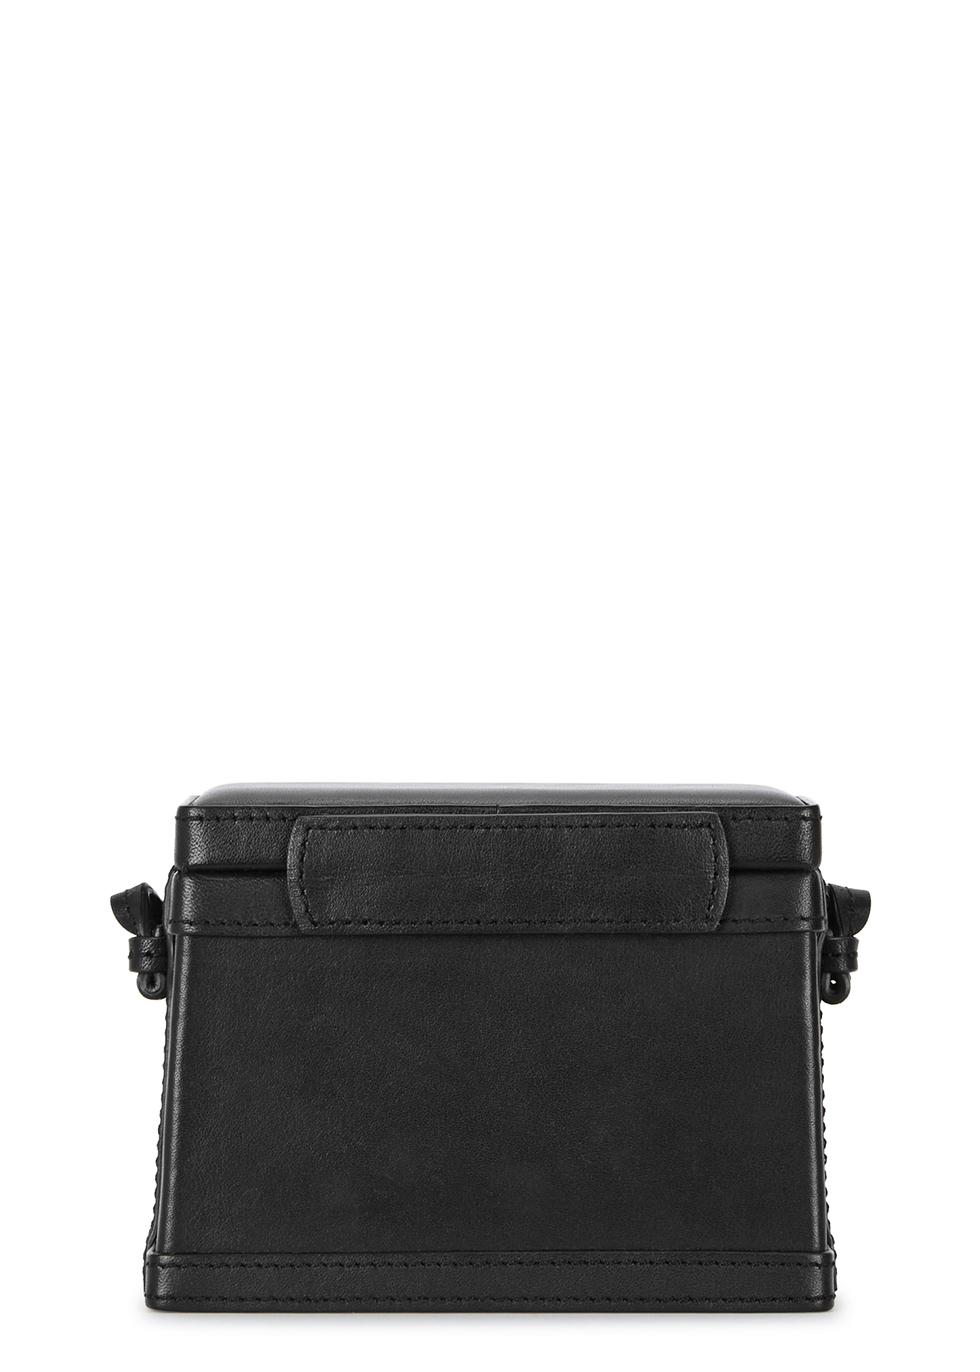 Black leather cross-body bag - Hunting Season